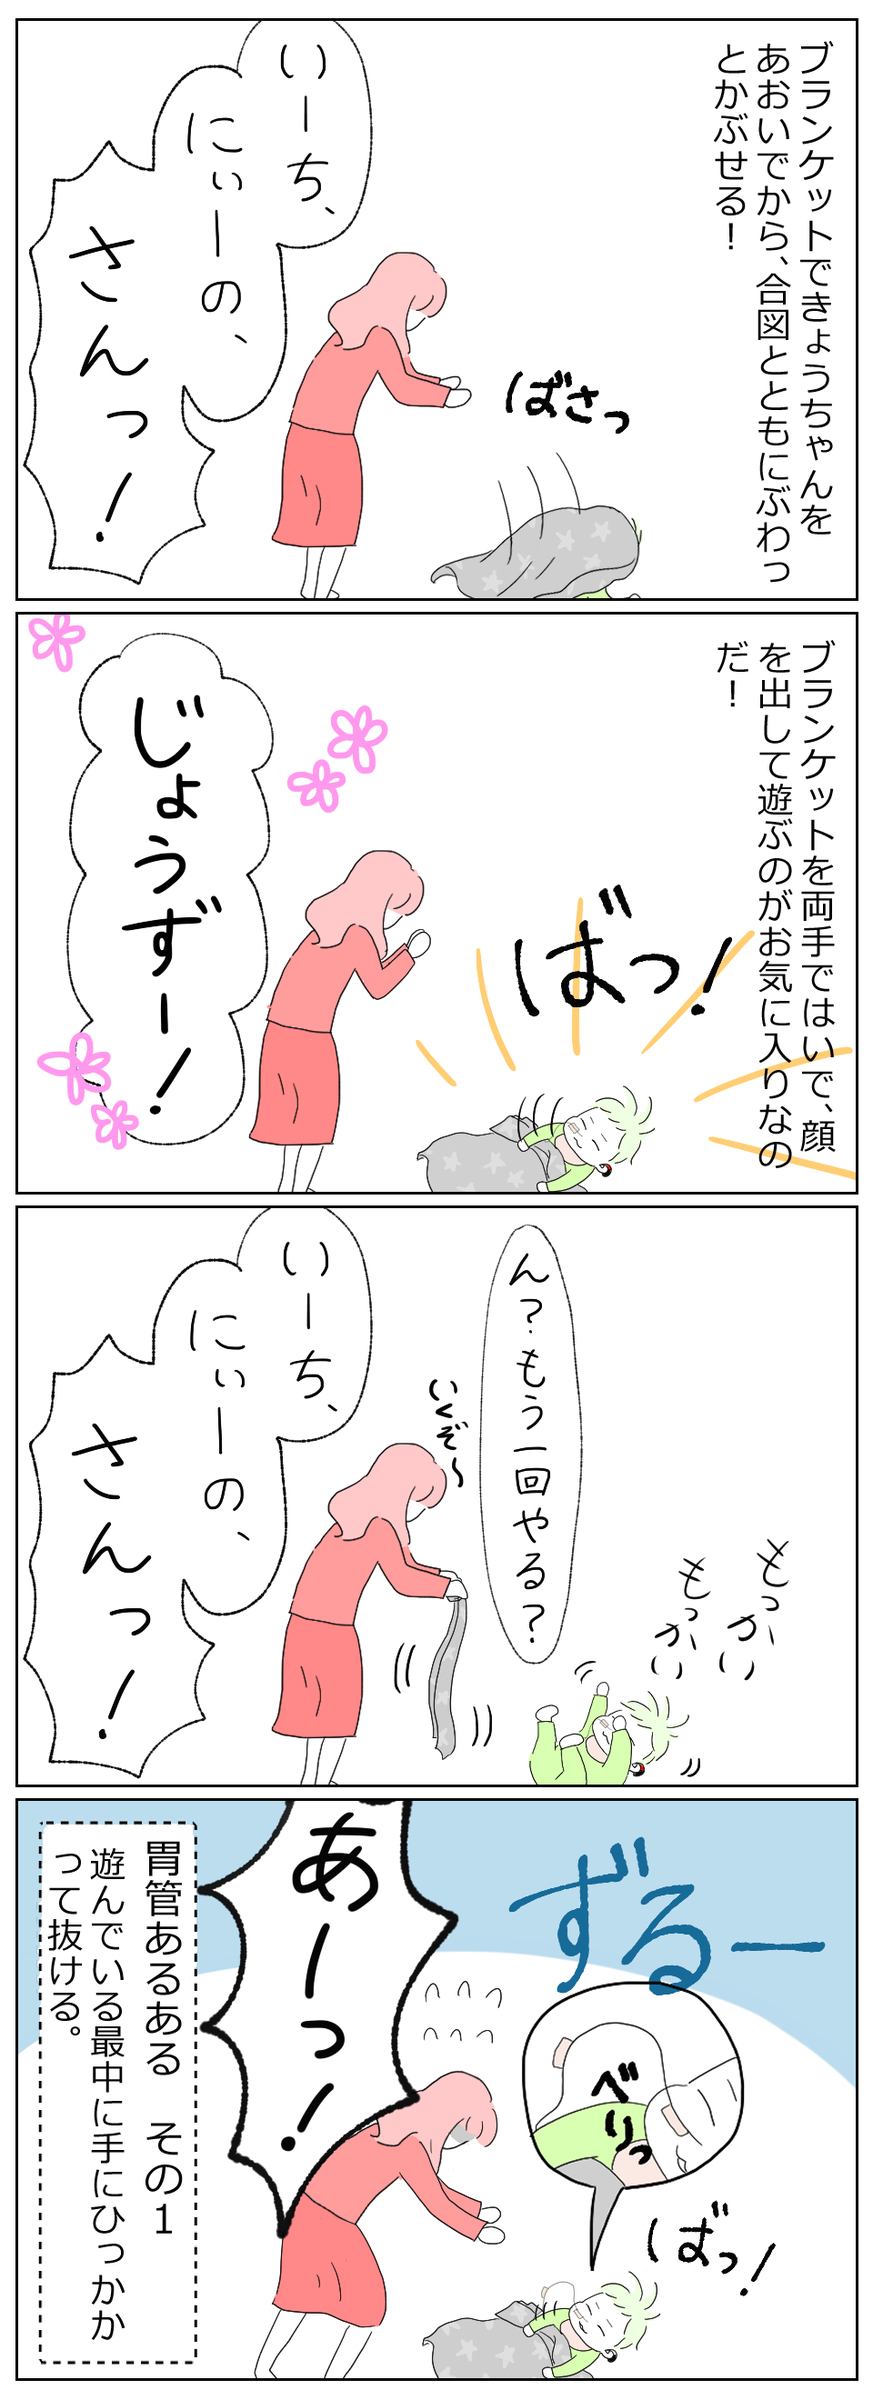 f:id:kayarimo:20190315220150j:plain